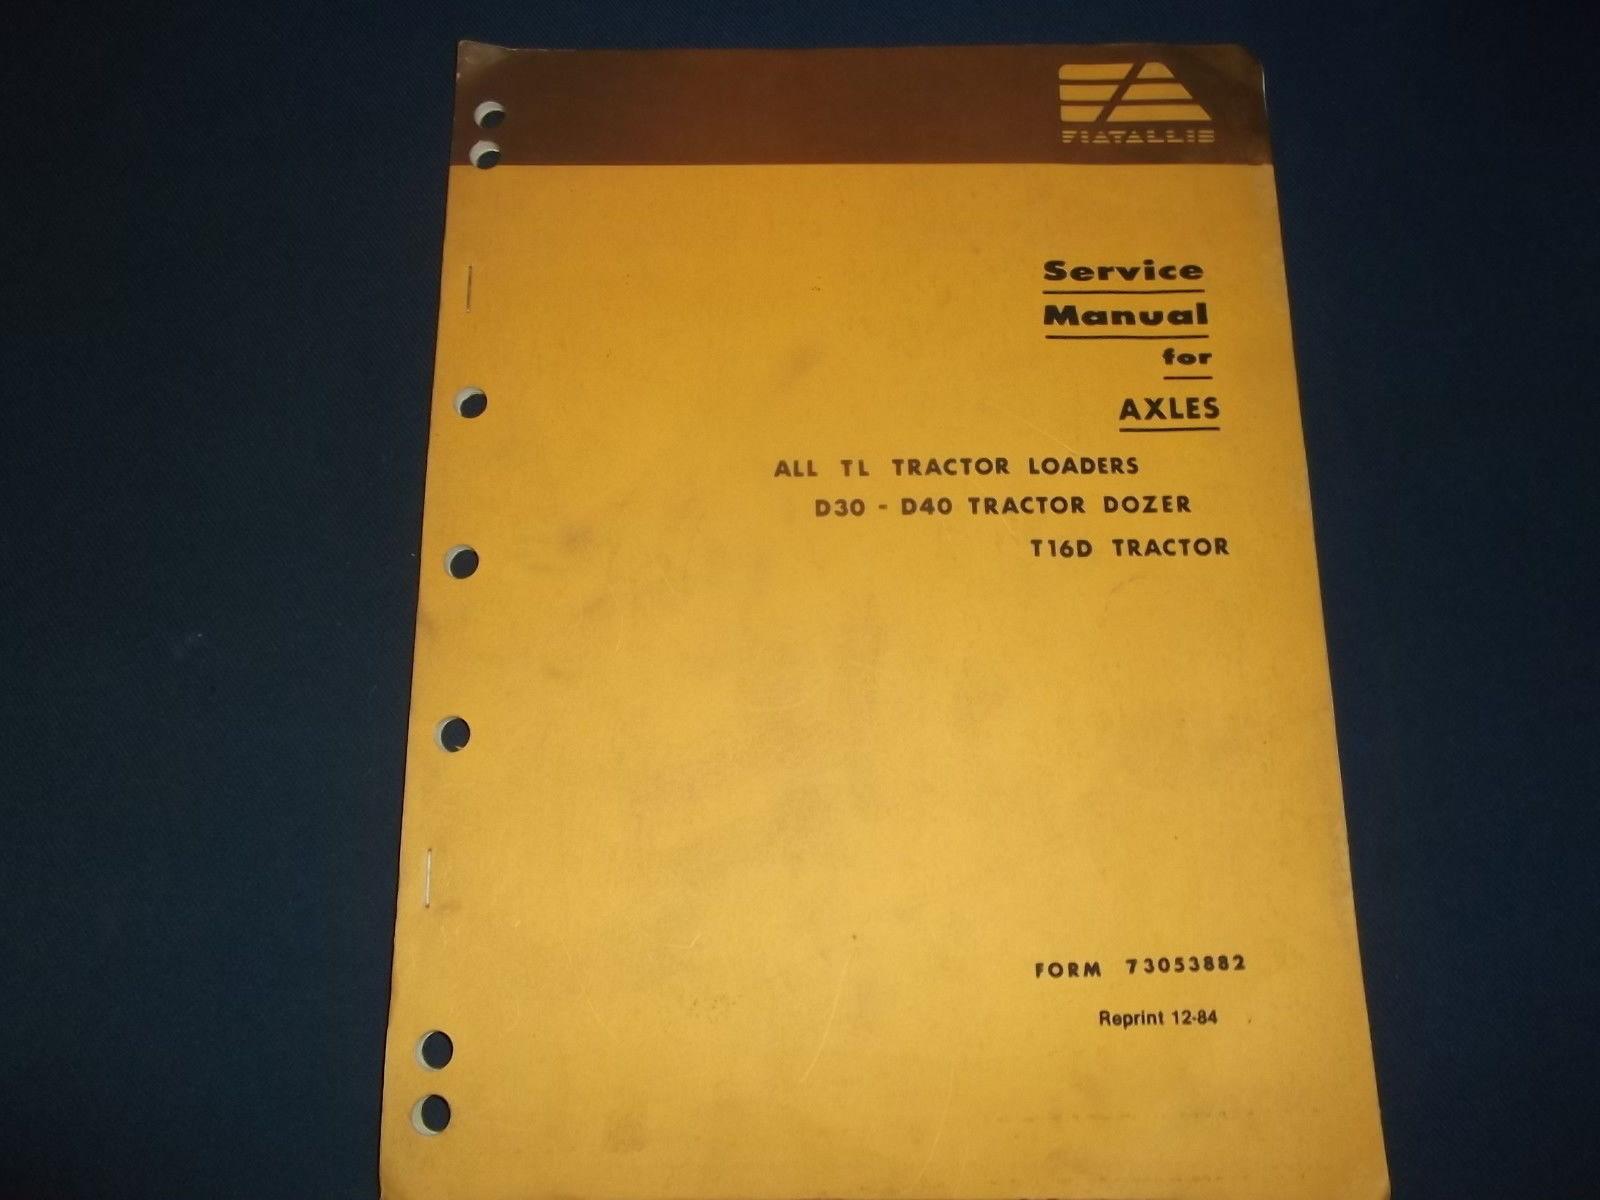 Fiat , Fiat-Hitachi, Fiat-Kobelco Workshop Service Manuals